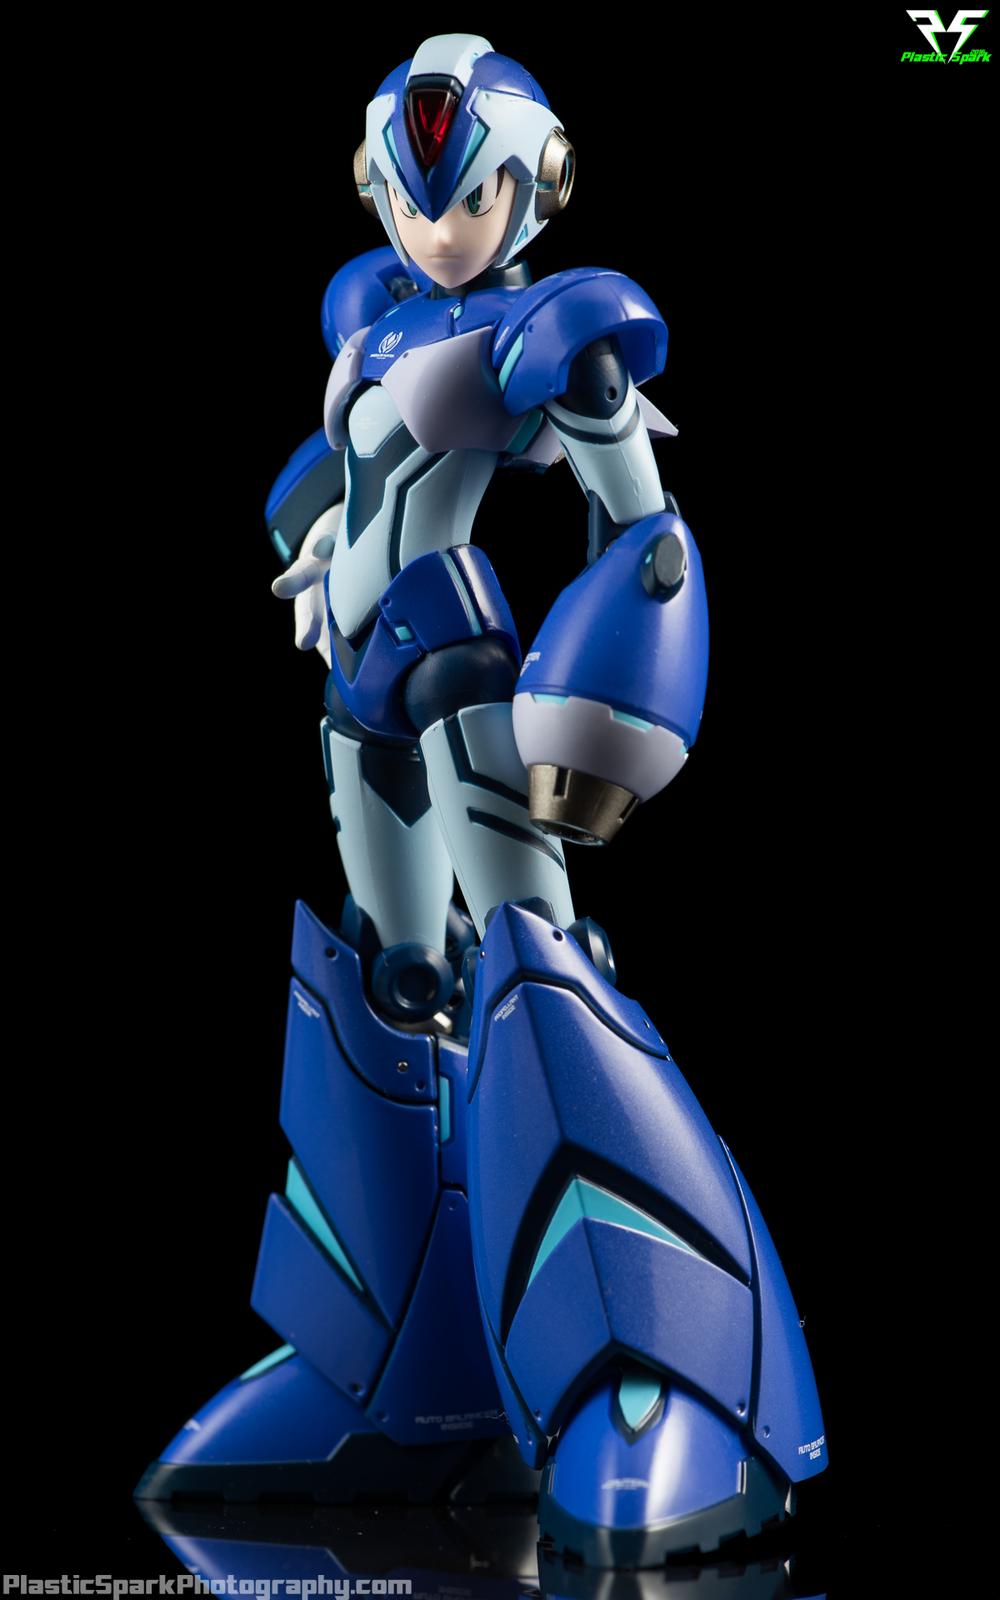 Truforce-Megaman-X-(15-of-17).png